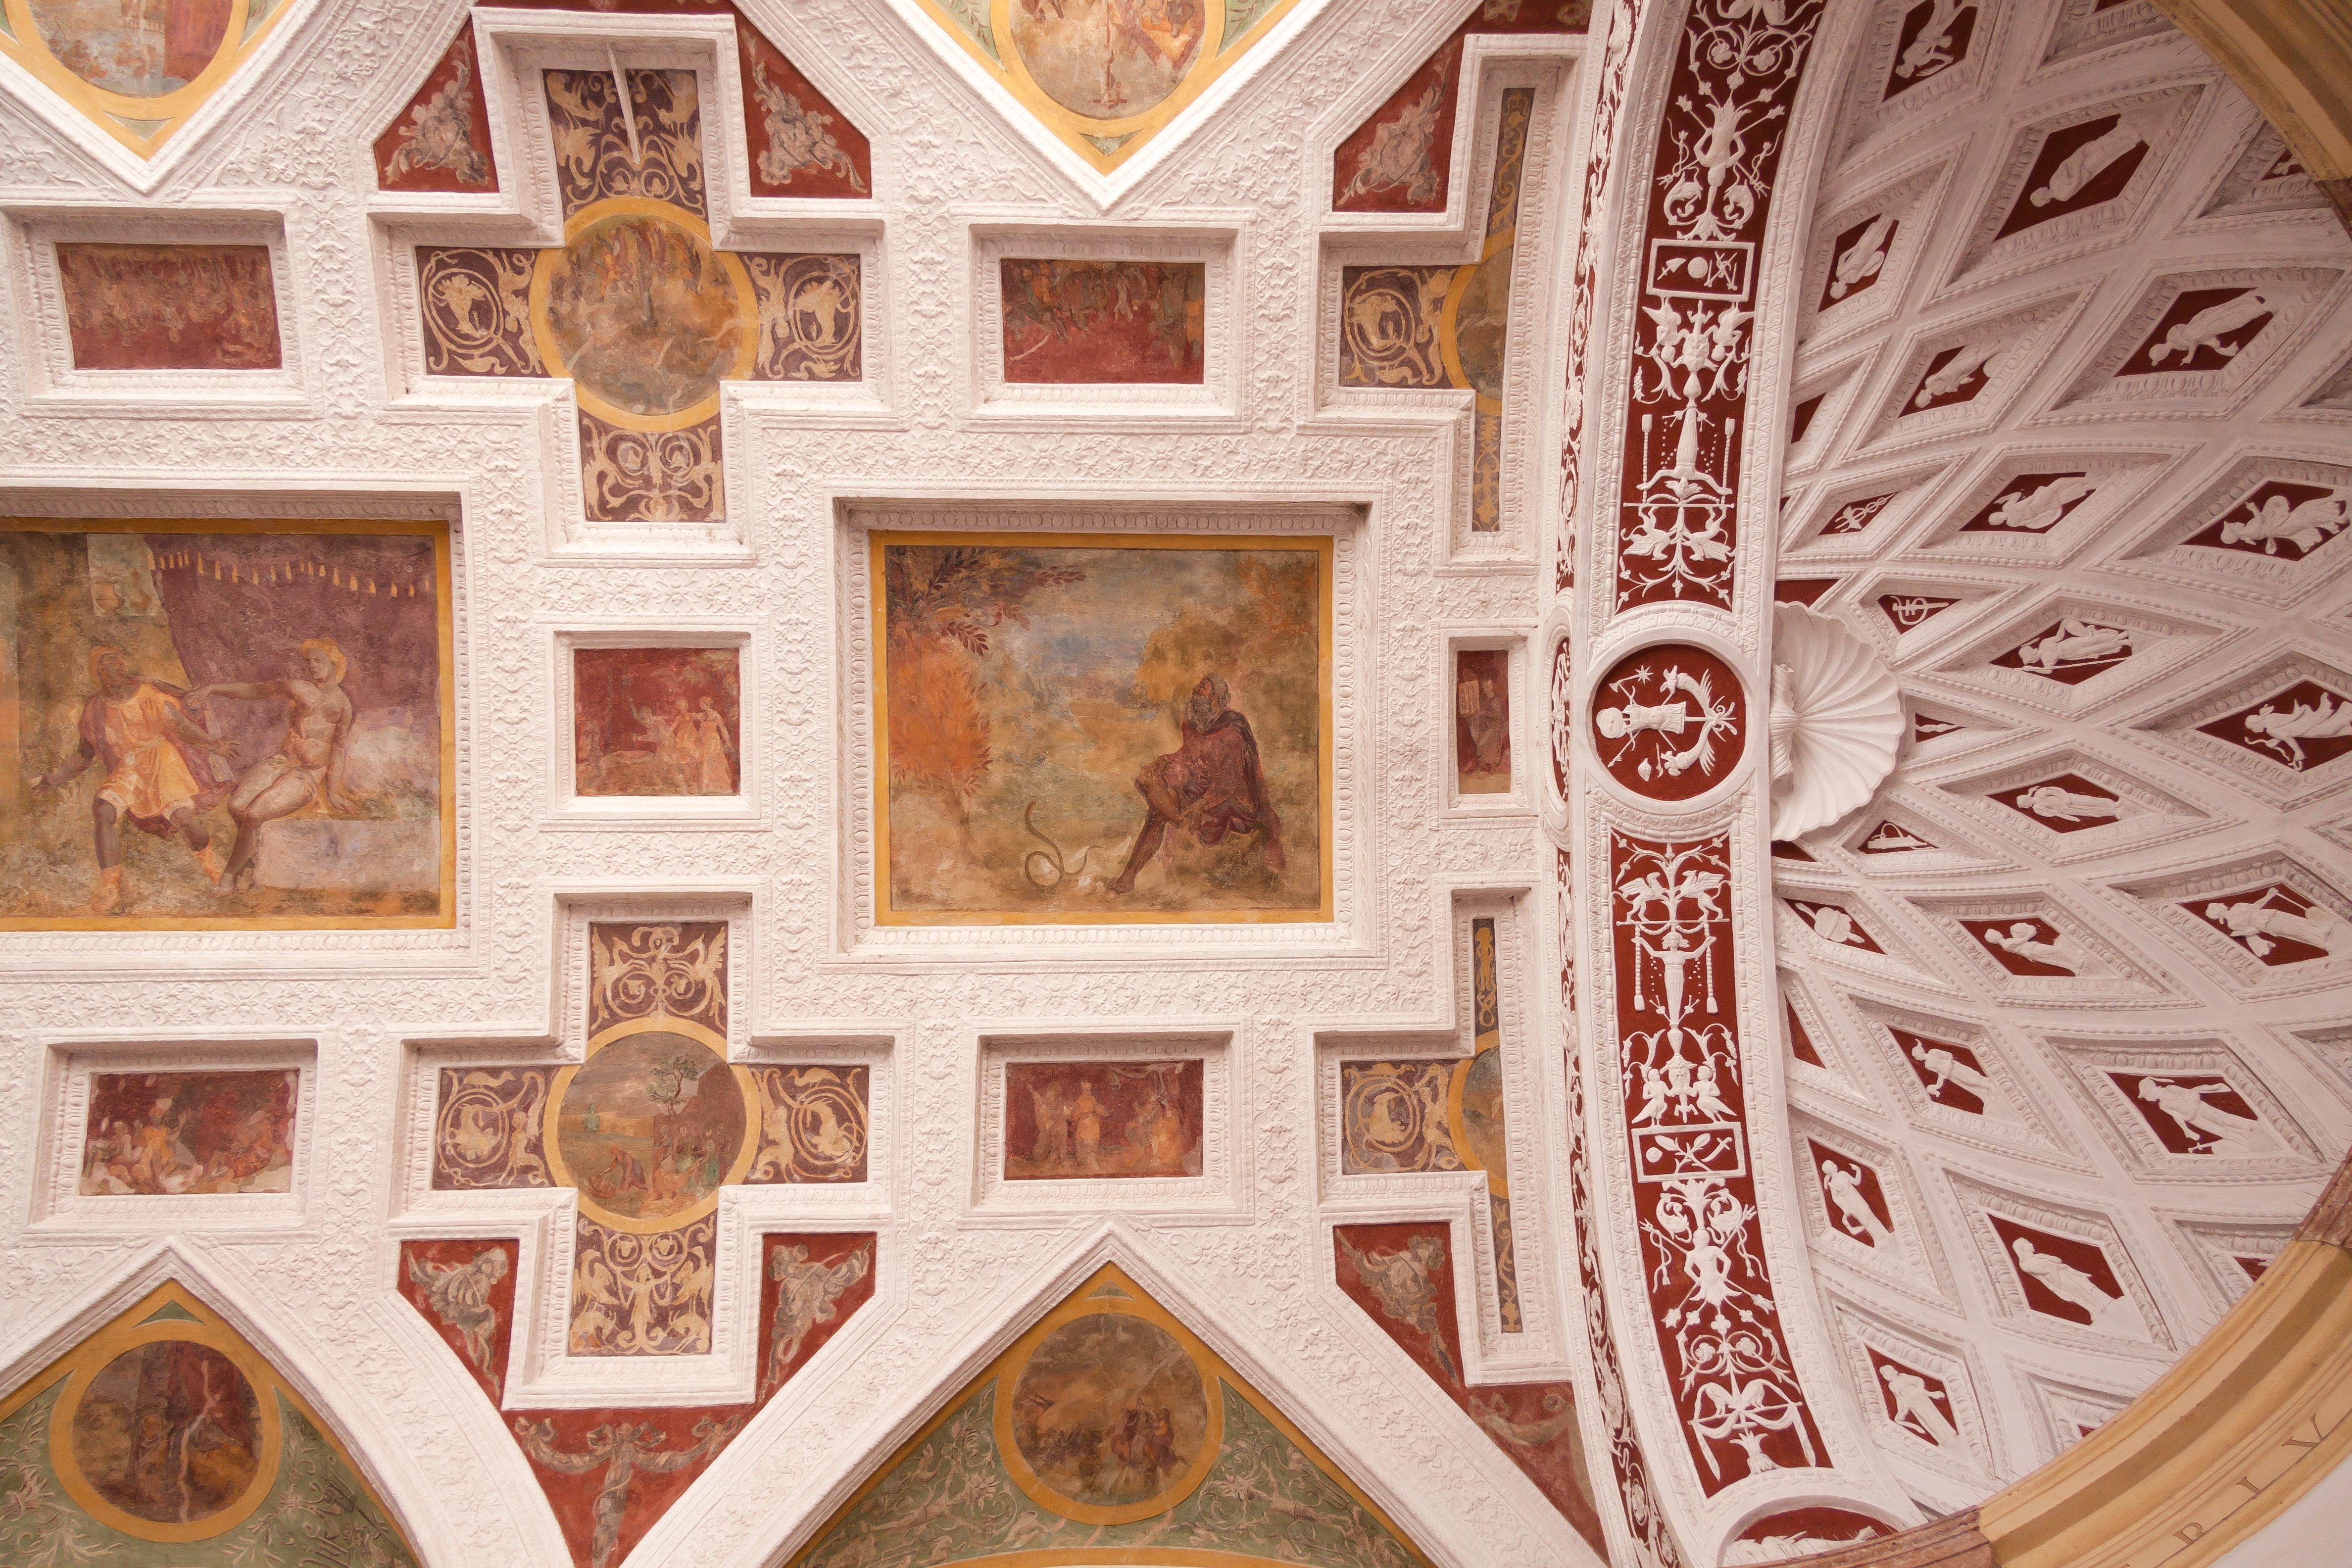 Window Building Wall Facade Residence Interior Design Art Courtyard Temple Picture Frame Bavaria Renaissance Fresco Carving Duke Arcades